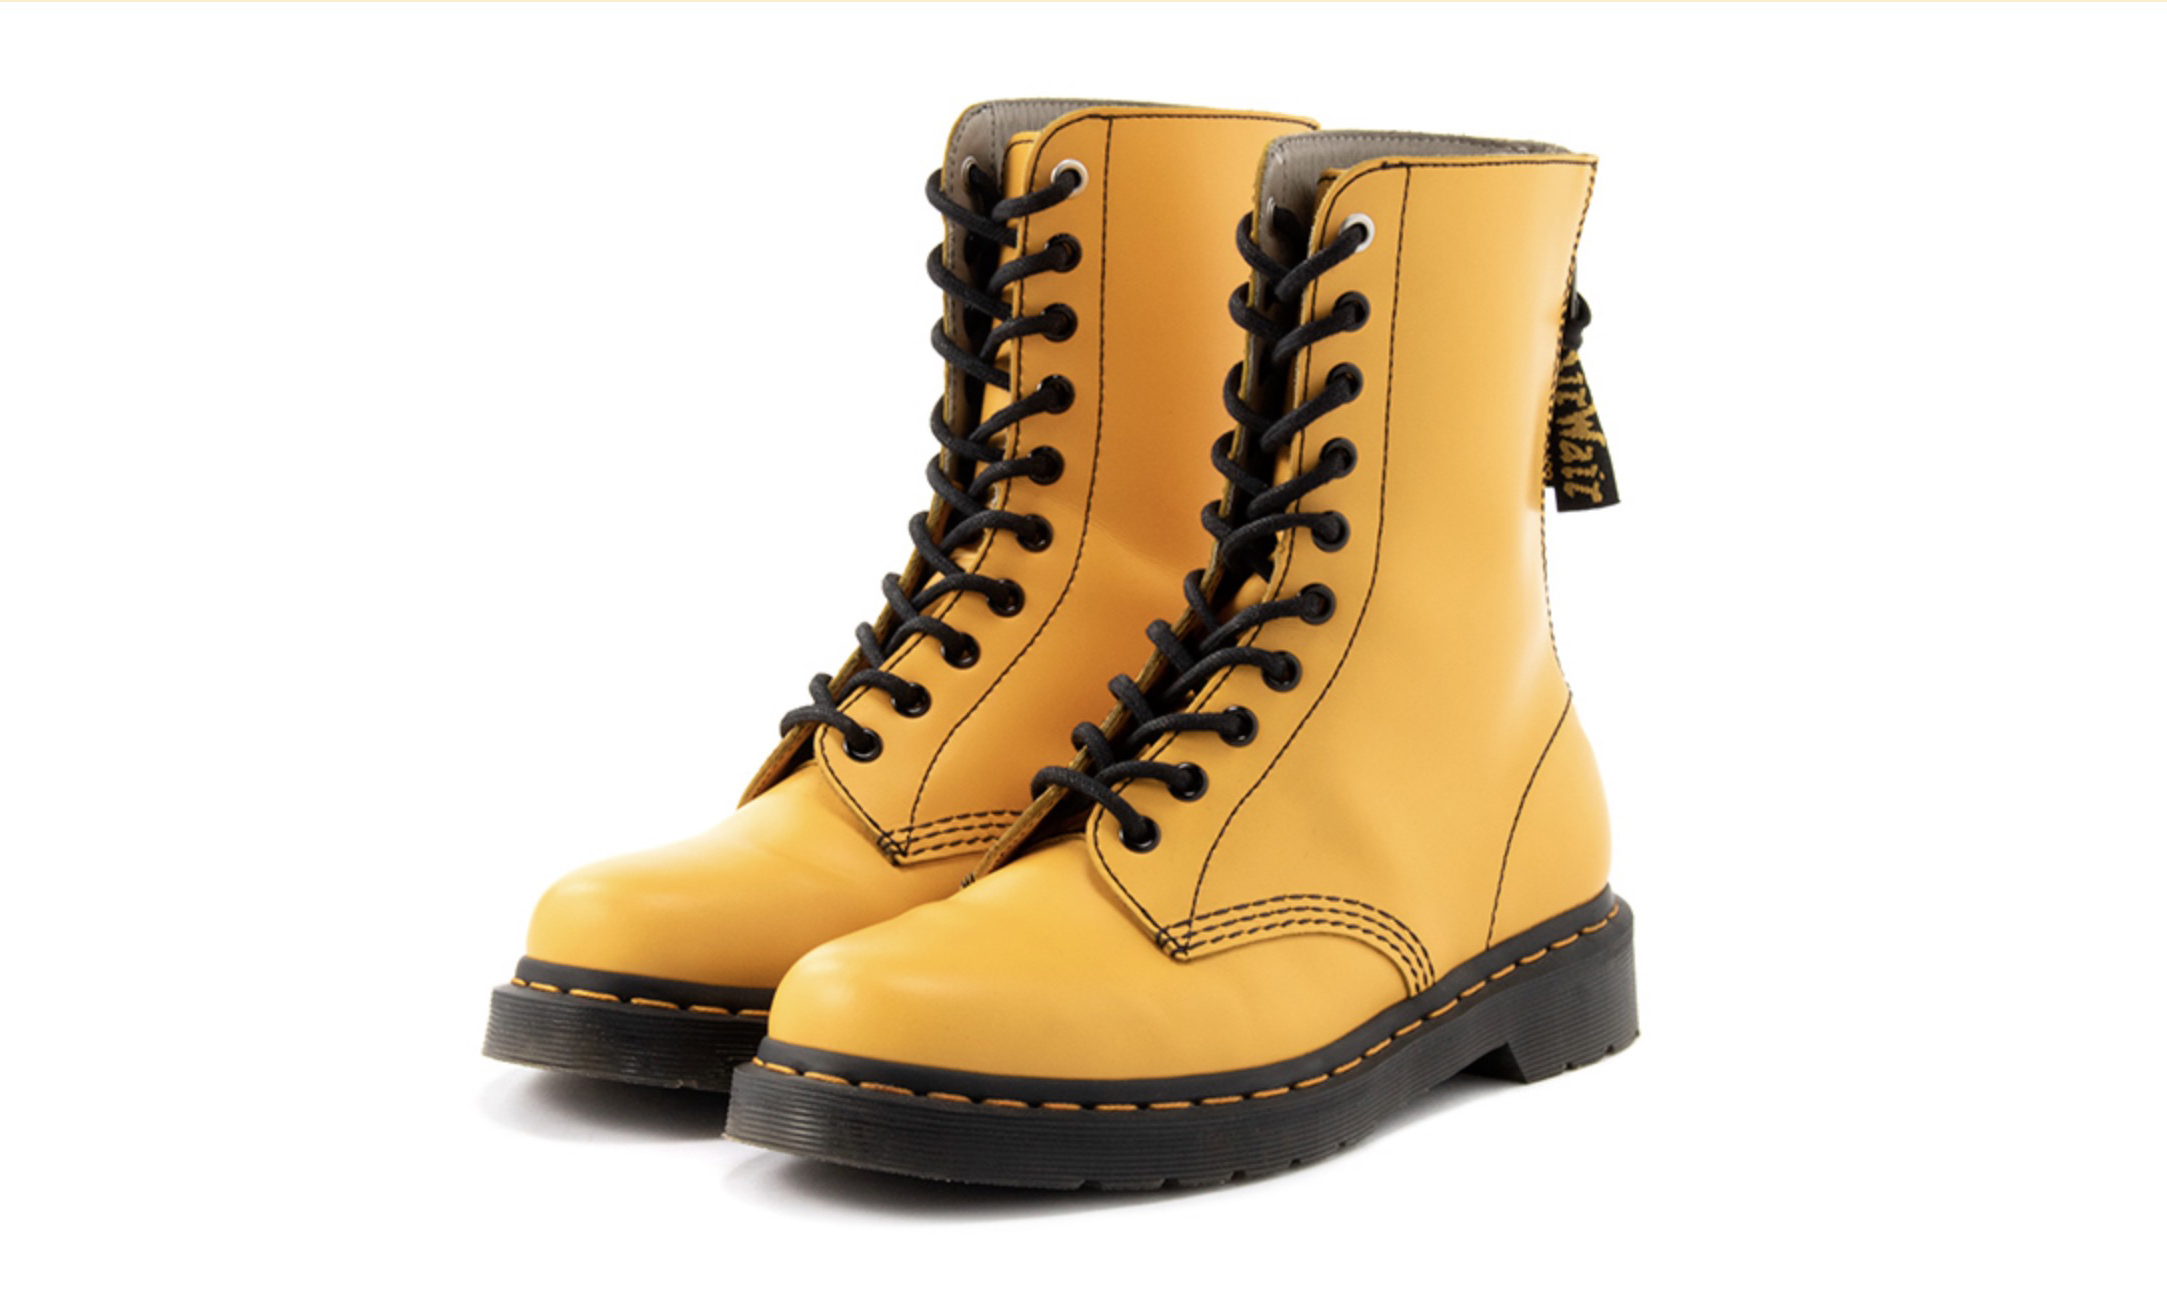 Y's 携手 Dr.Martens 推出全新联名十孔复古靴款